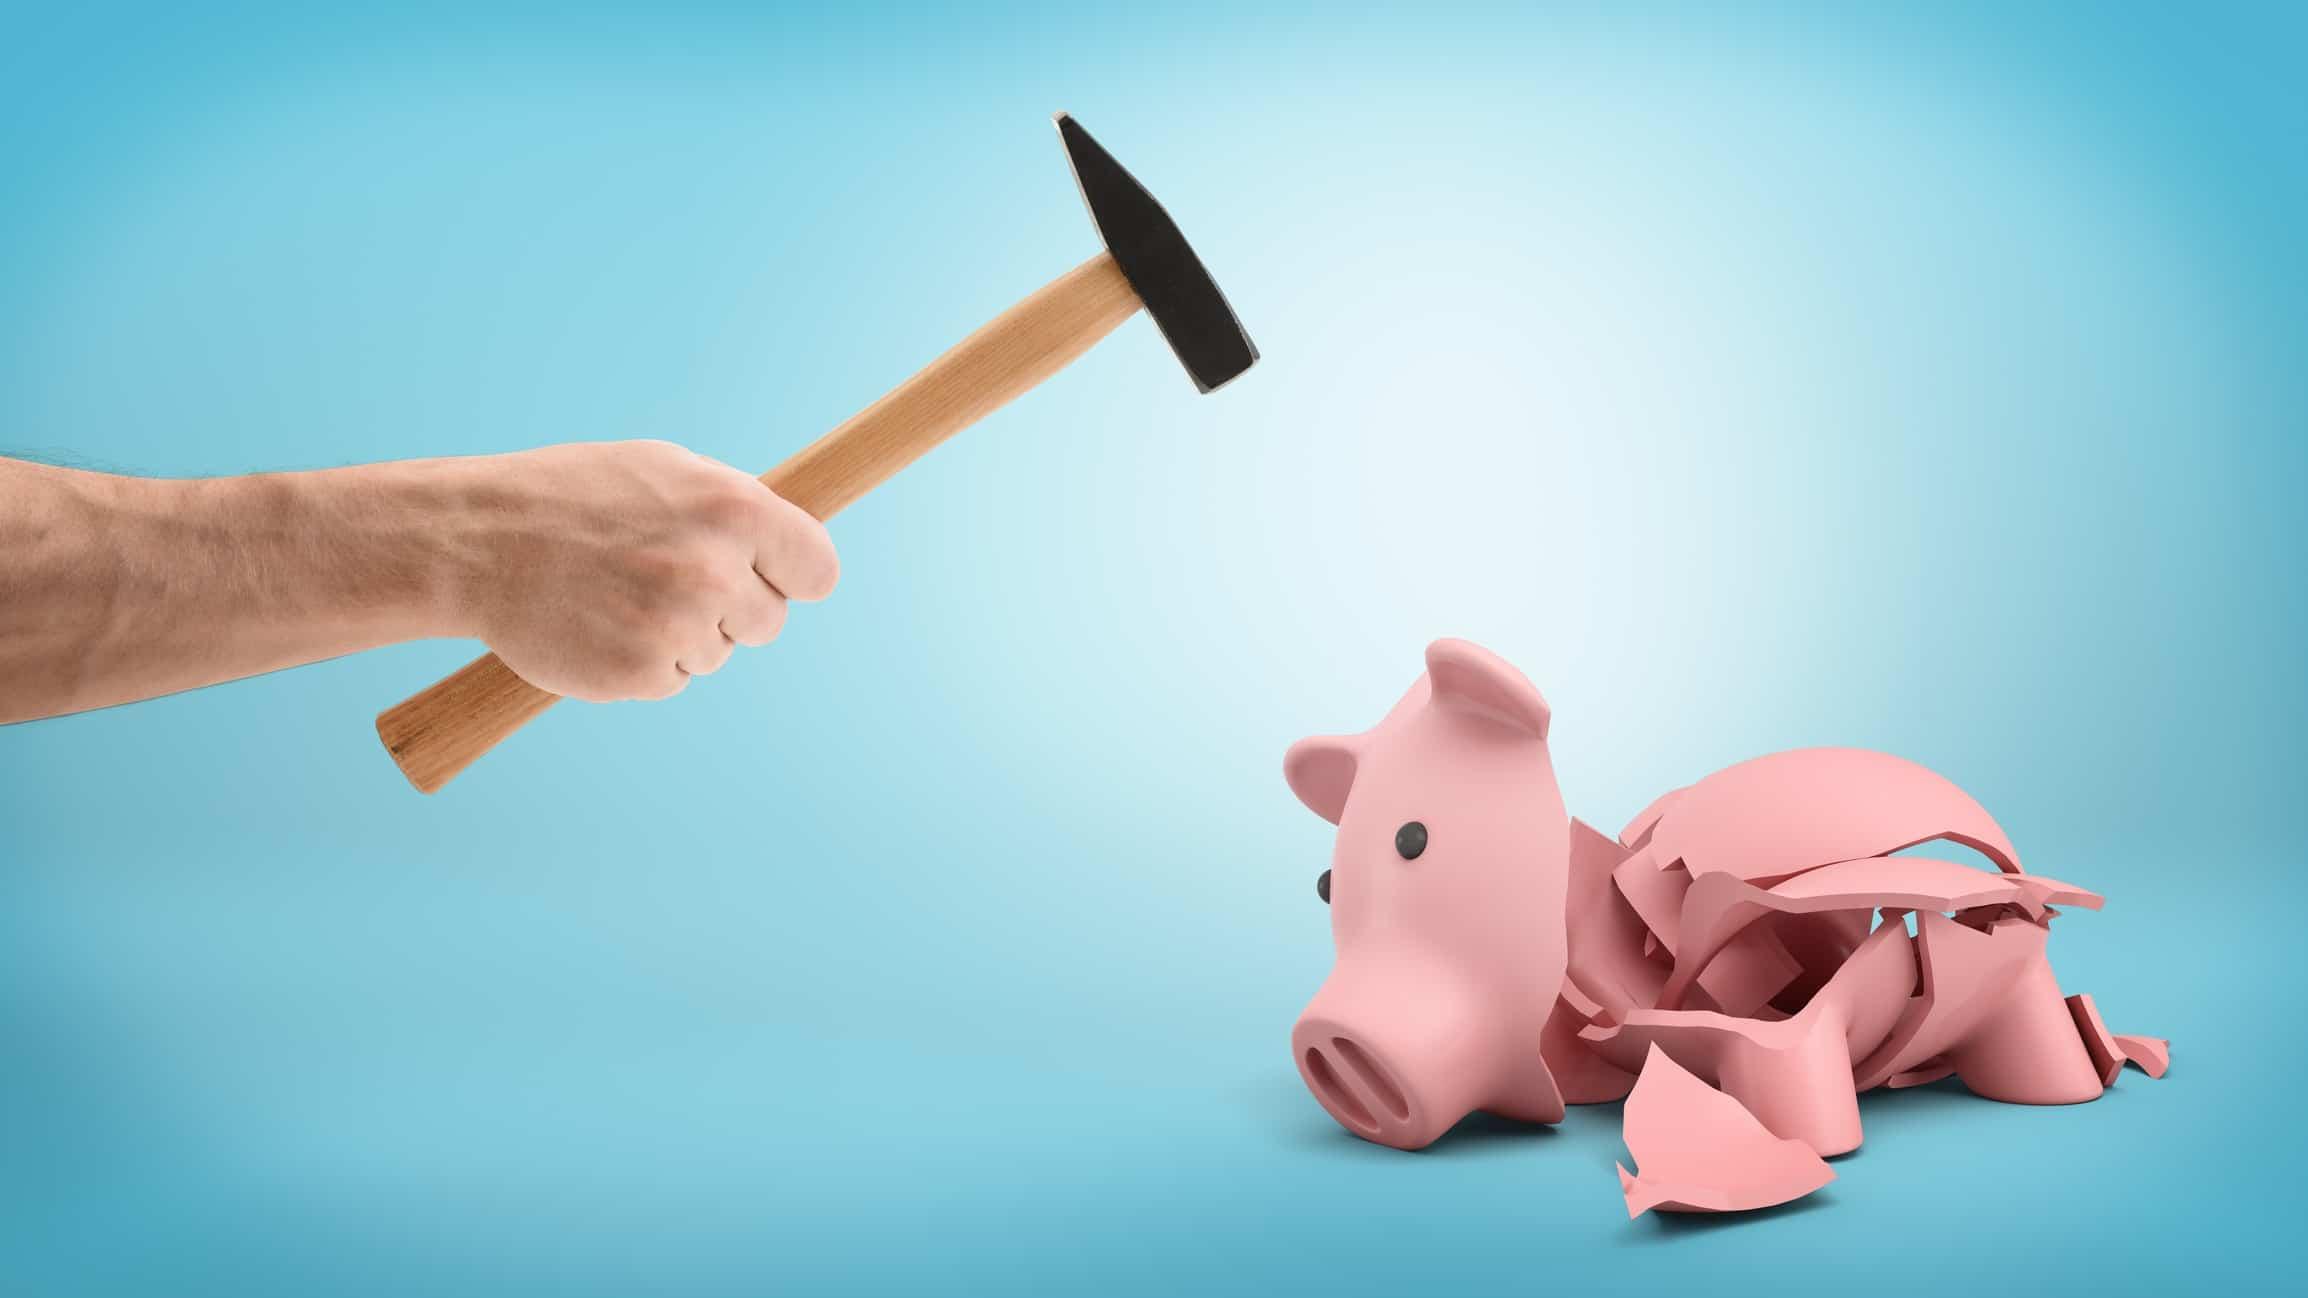 hand holding hammer smashing open empty piggy bank